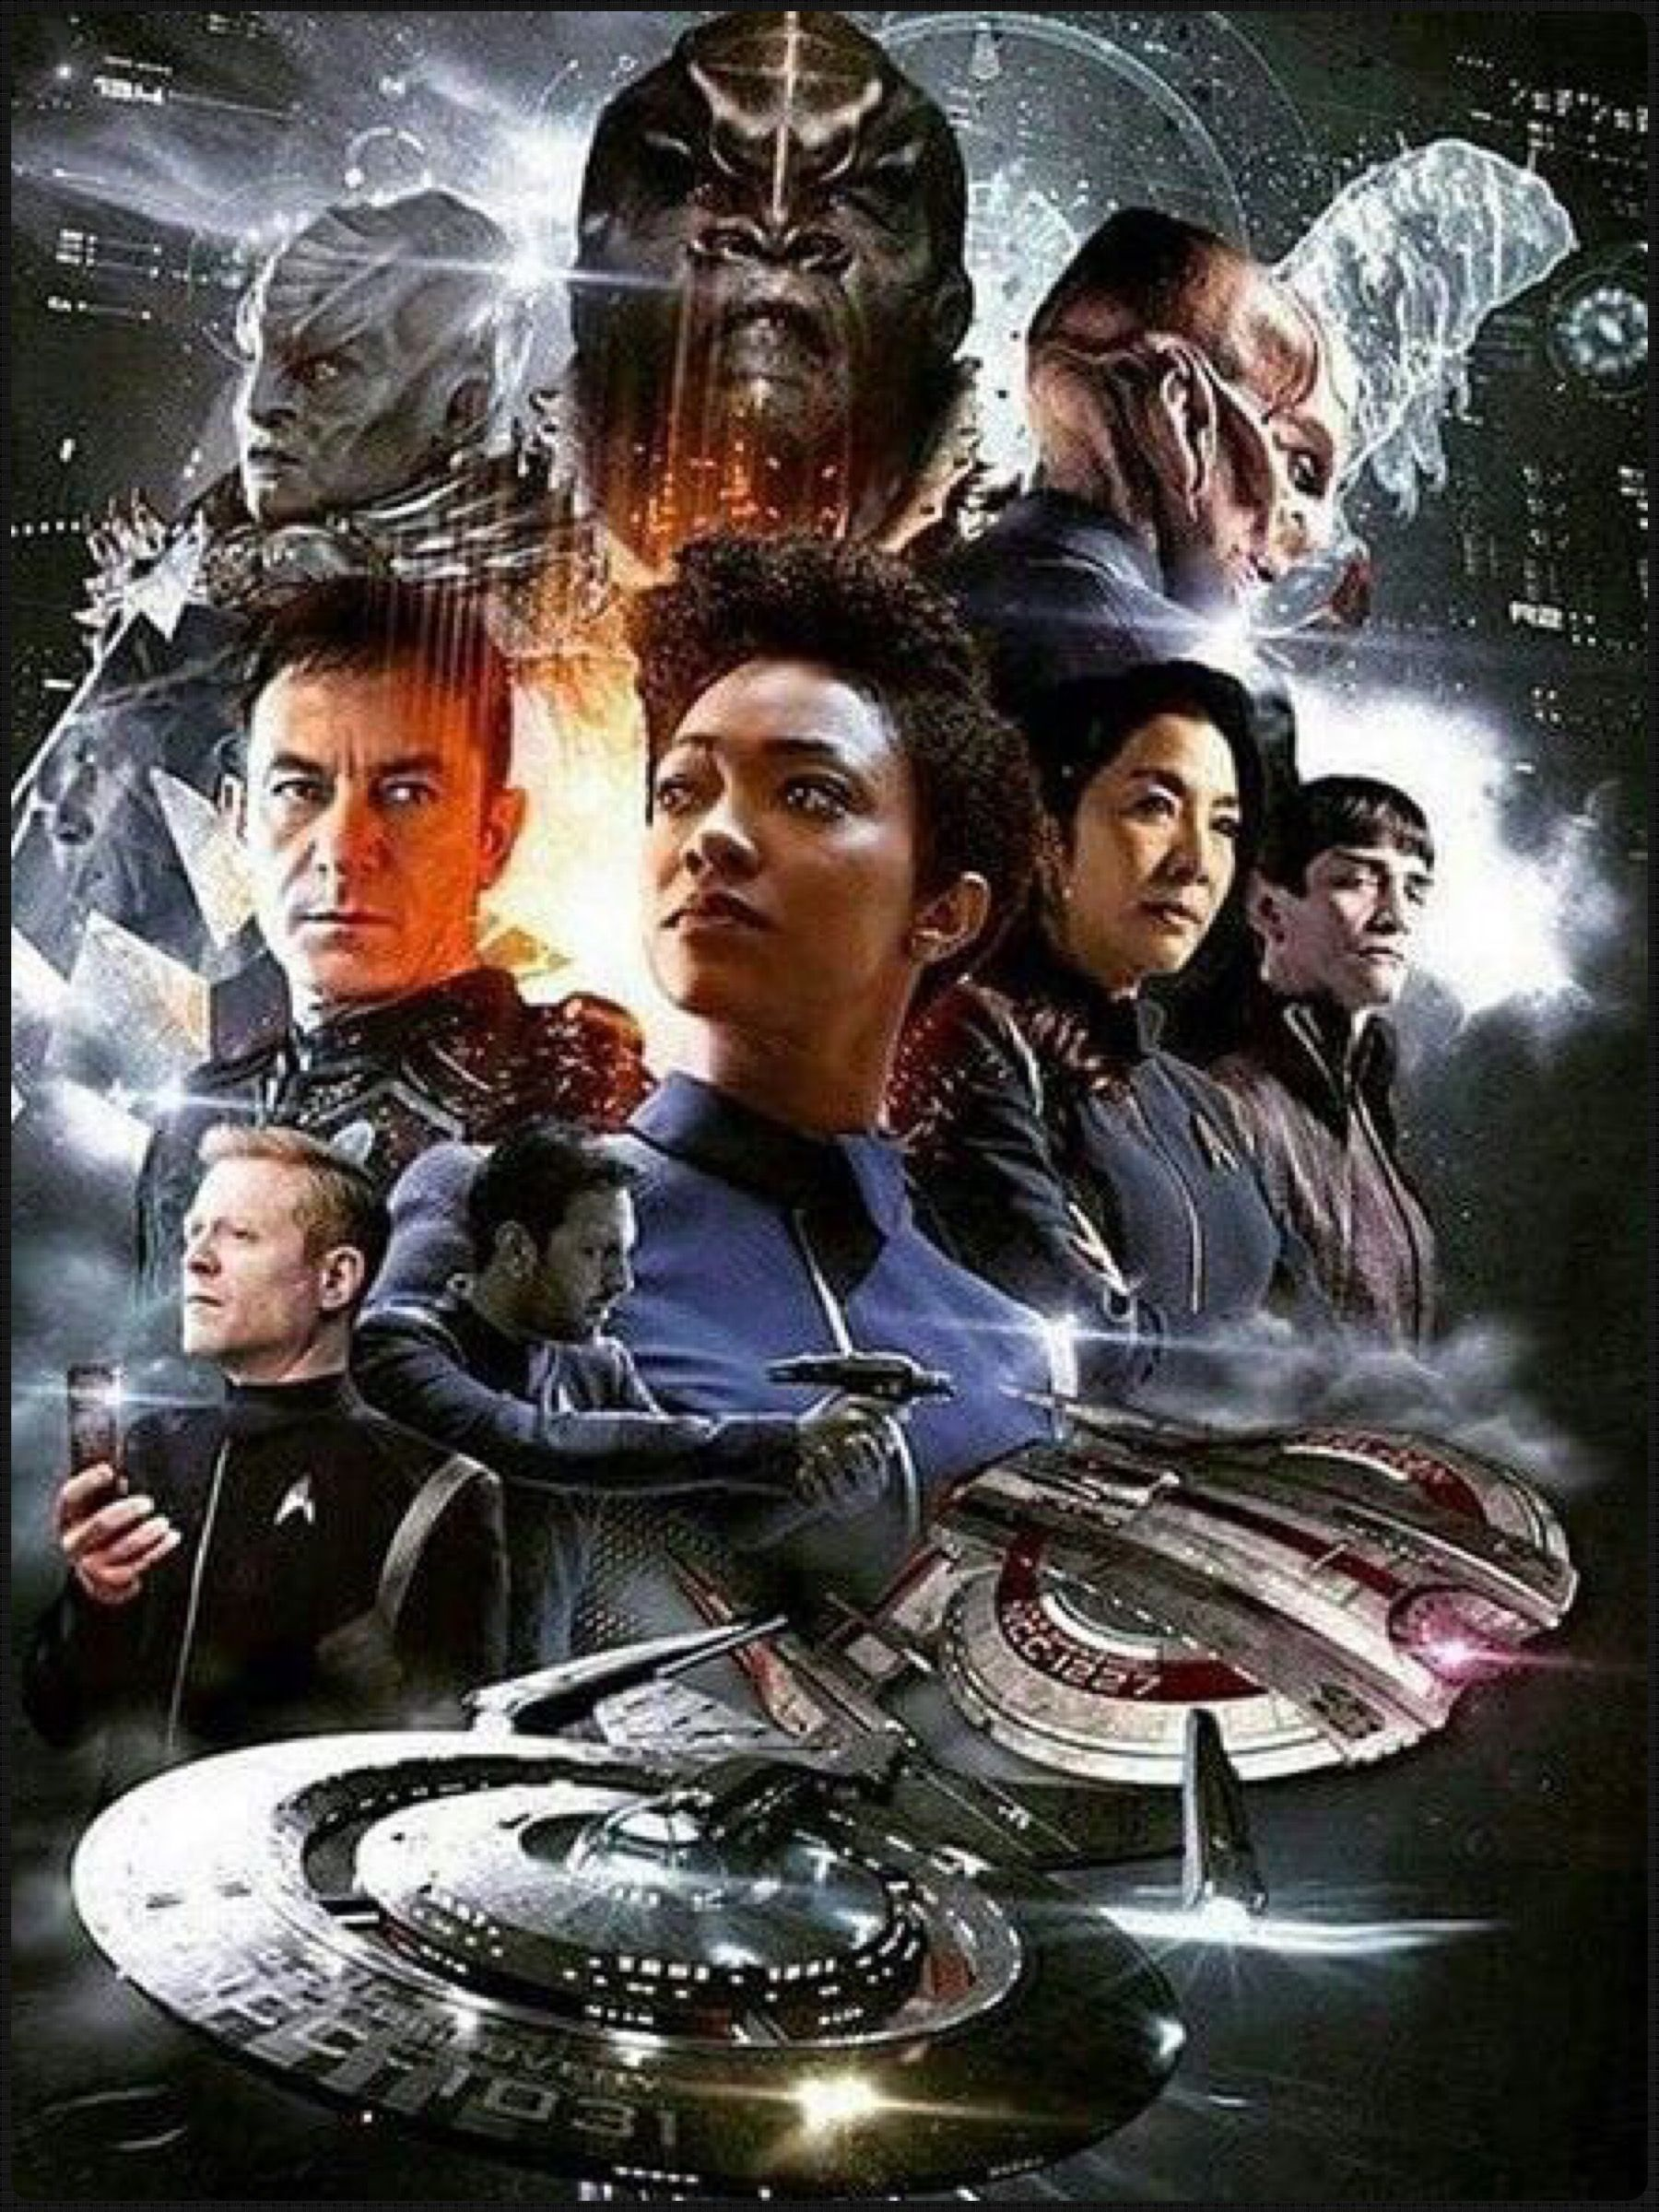 Star Trek Discovery Starring Sonequa Martin As First Officer Michael Burnham U S S Discovery Star Trek Posters Fandom Star Trek Star Trek Tv